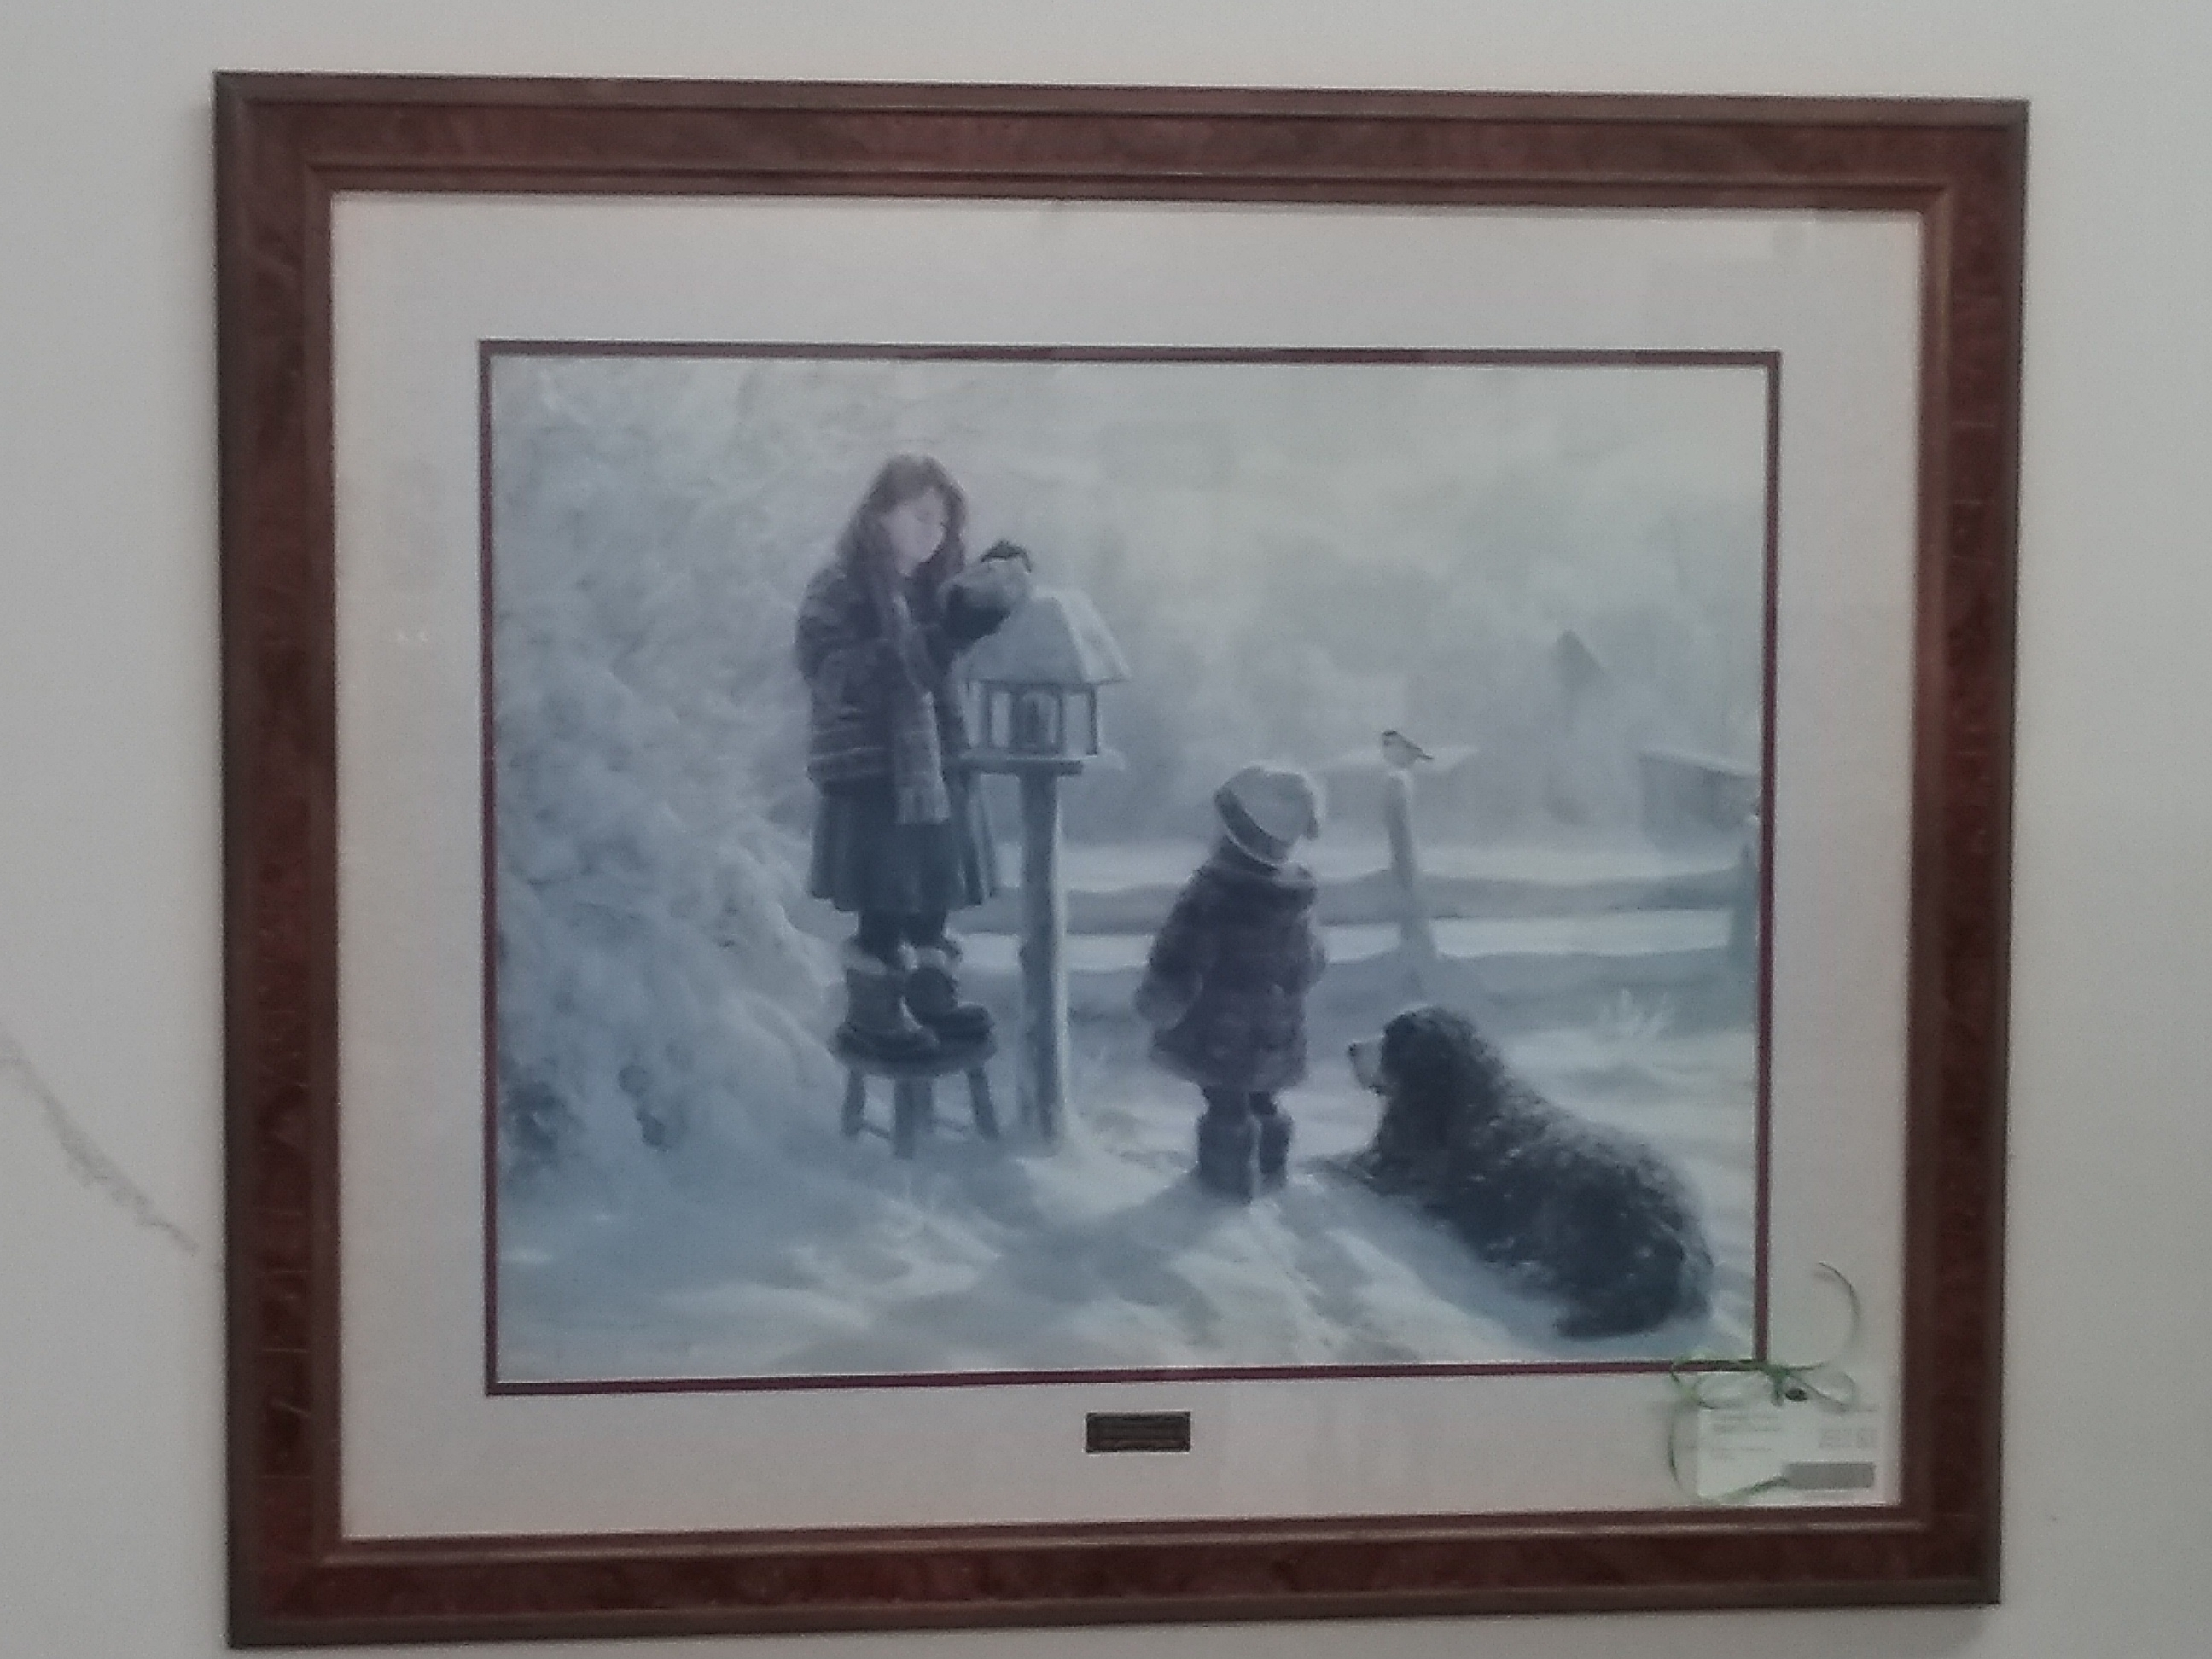 Framed Print Robert Duncan | The Millionaire's Daughter With Regard To Recent Robert Duncan Framed Art Prints (View 5 of 15)